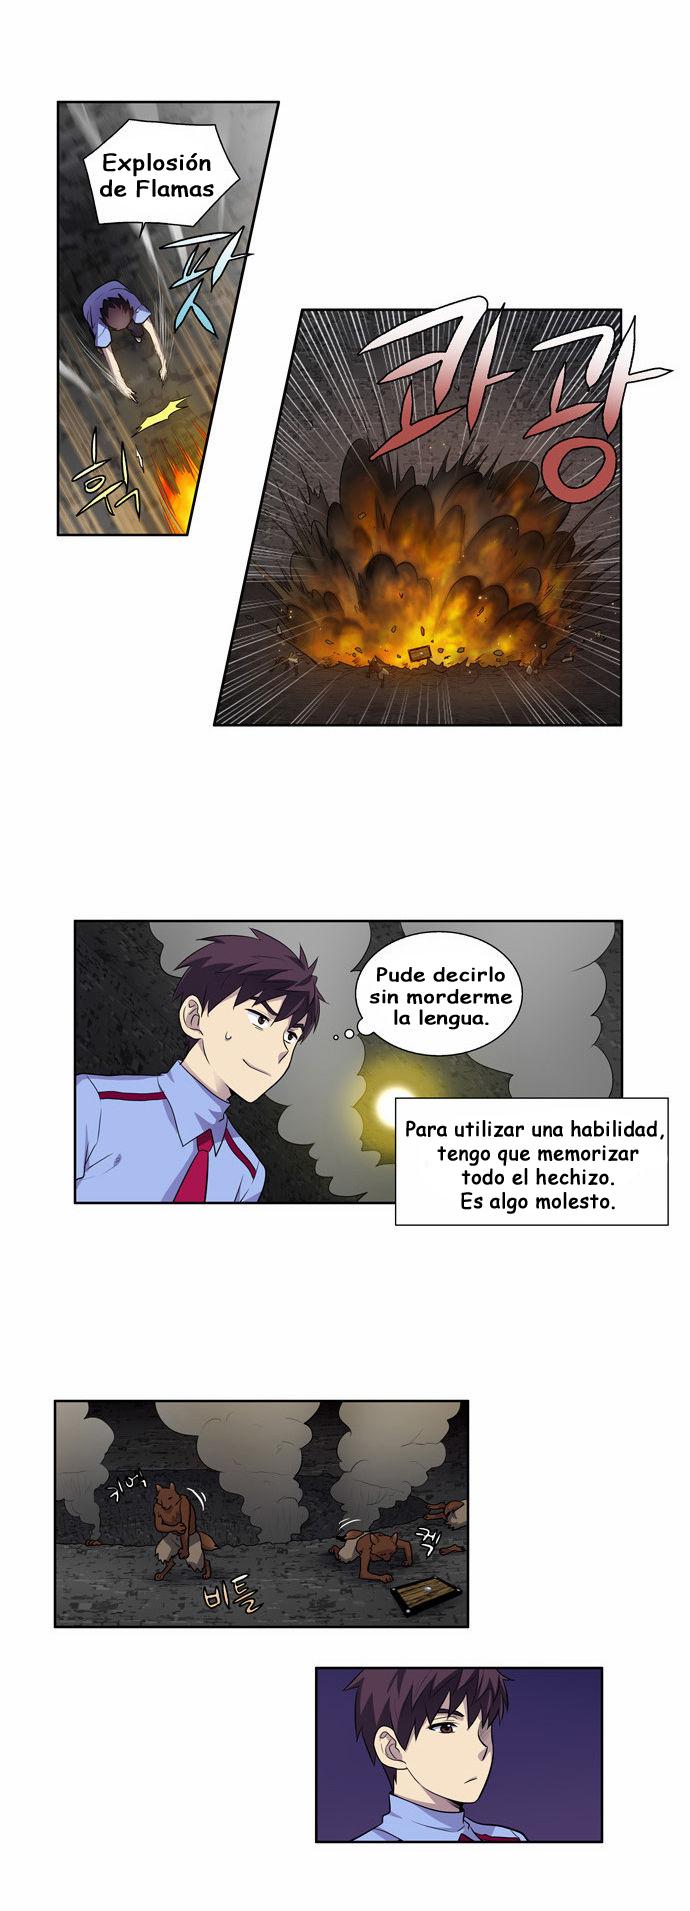 https://c5.ninemanga.com/es_manga/61/1725/396910/089d388e6181f1f6c55e994343cd0ae2.jpg Page 7